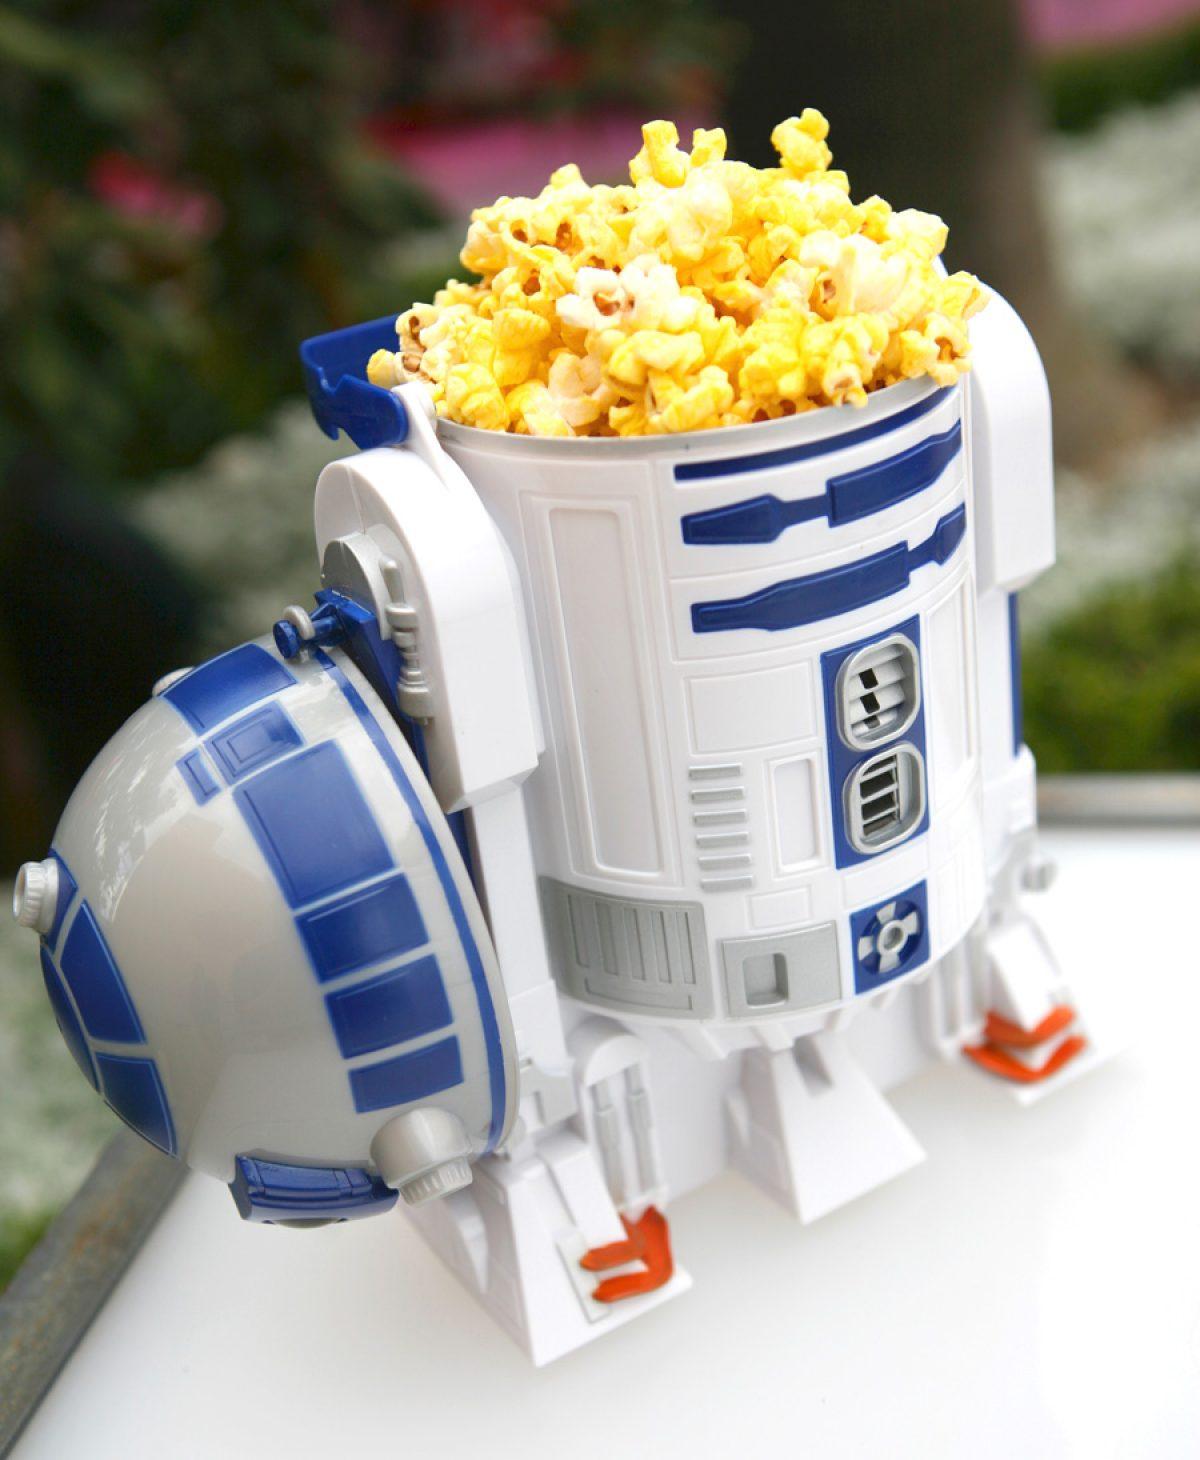 Disney Christmas Popcorn Bucket 2021 Ultimate Guide To Disney Refillable Popcorn Bucket Disney Popcorn Deals